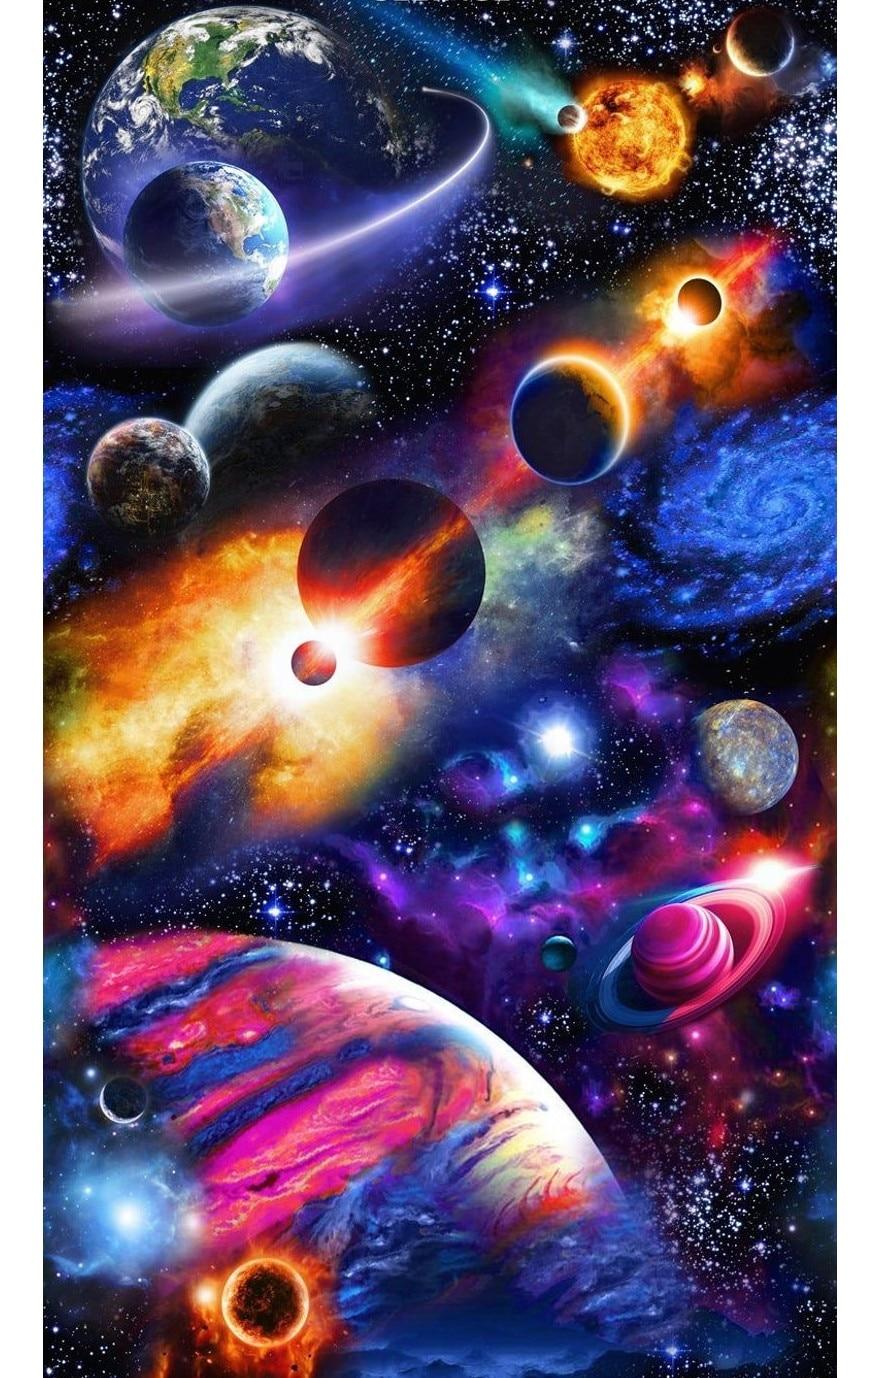 JMINE Div 5D espacio galaxia tierra universo planeta completo diamante pintura punto de cruz kits arte escénico pintura 3D por diamantes